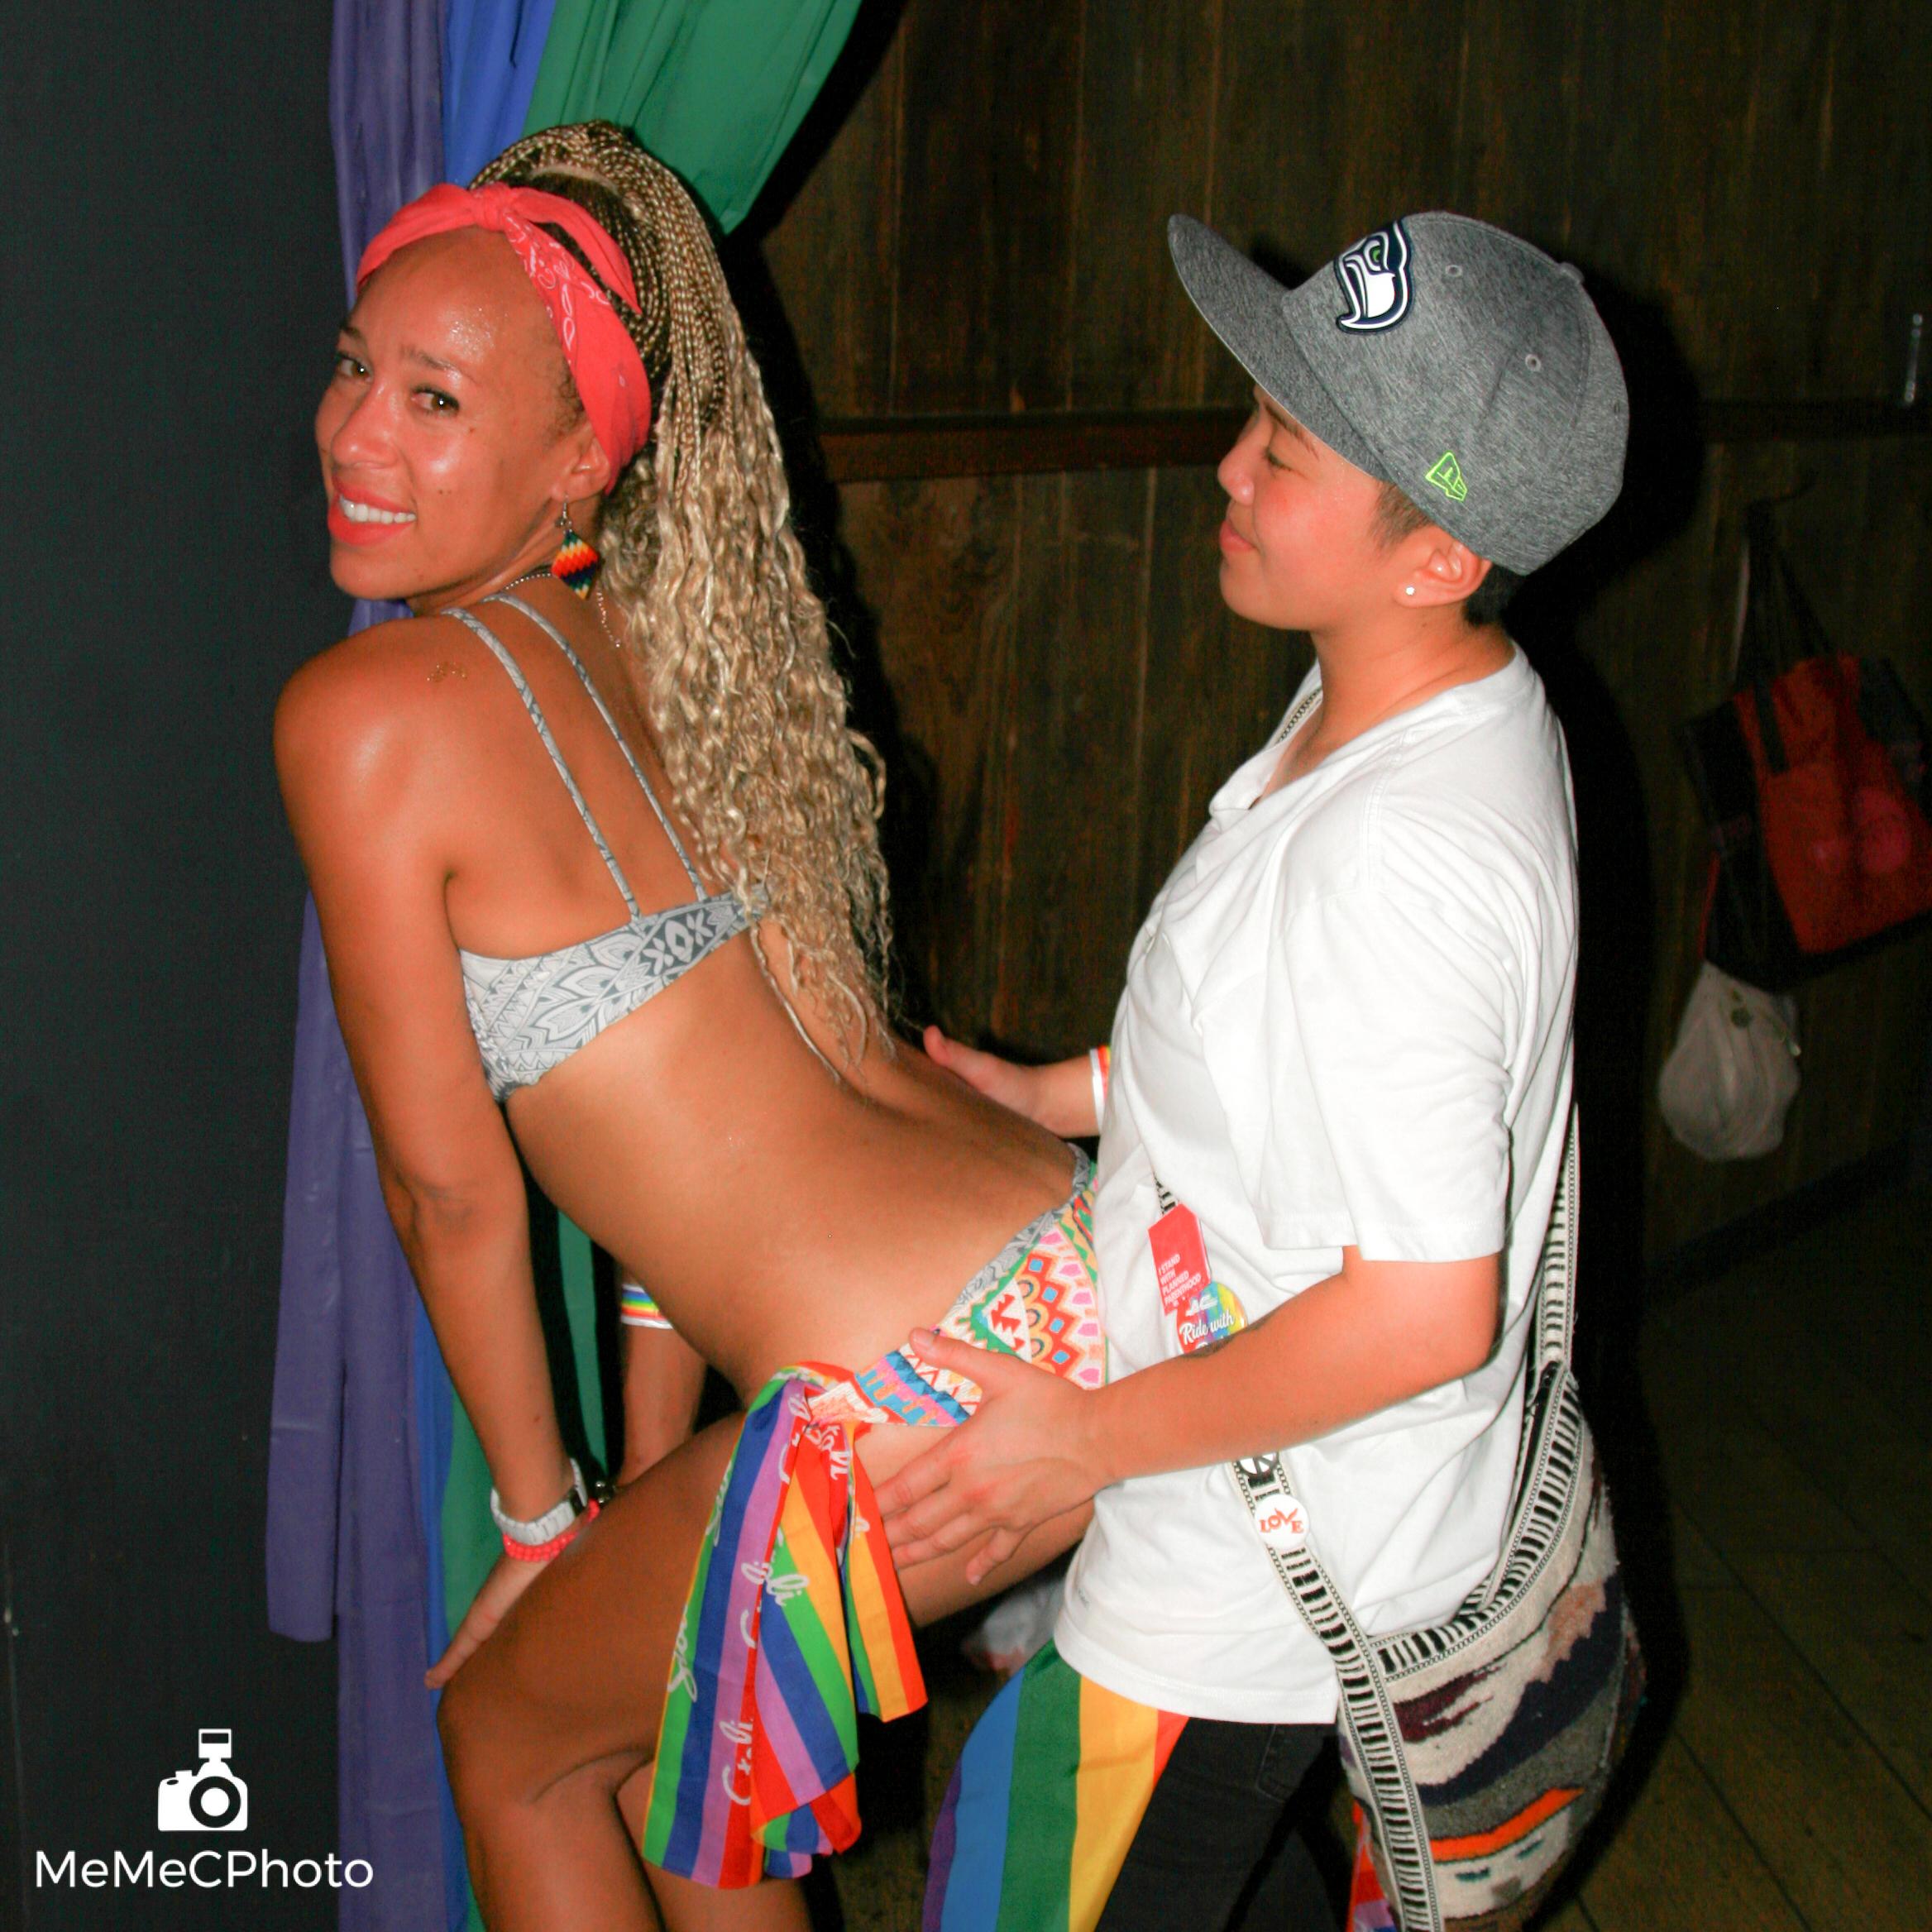 Port Bar Oakland Pride - 141-132.jpg